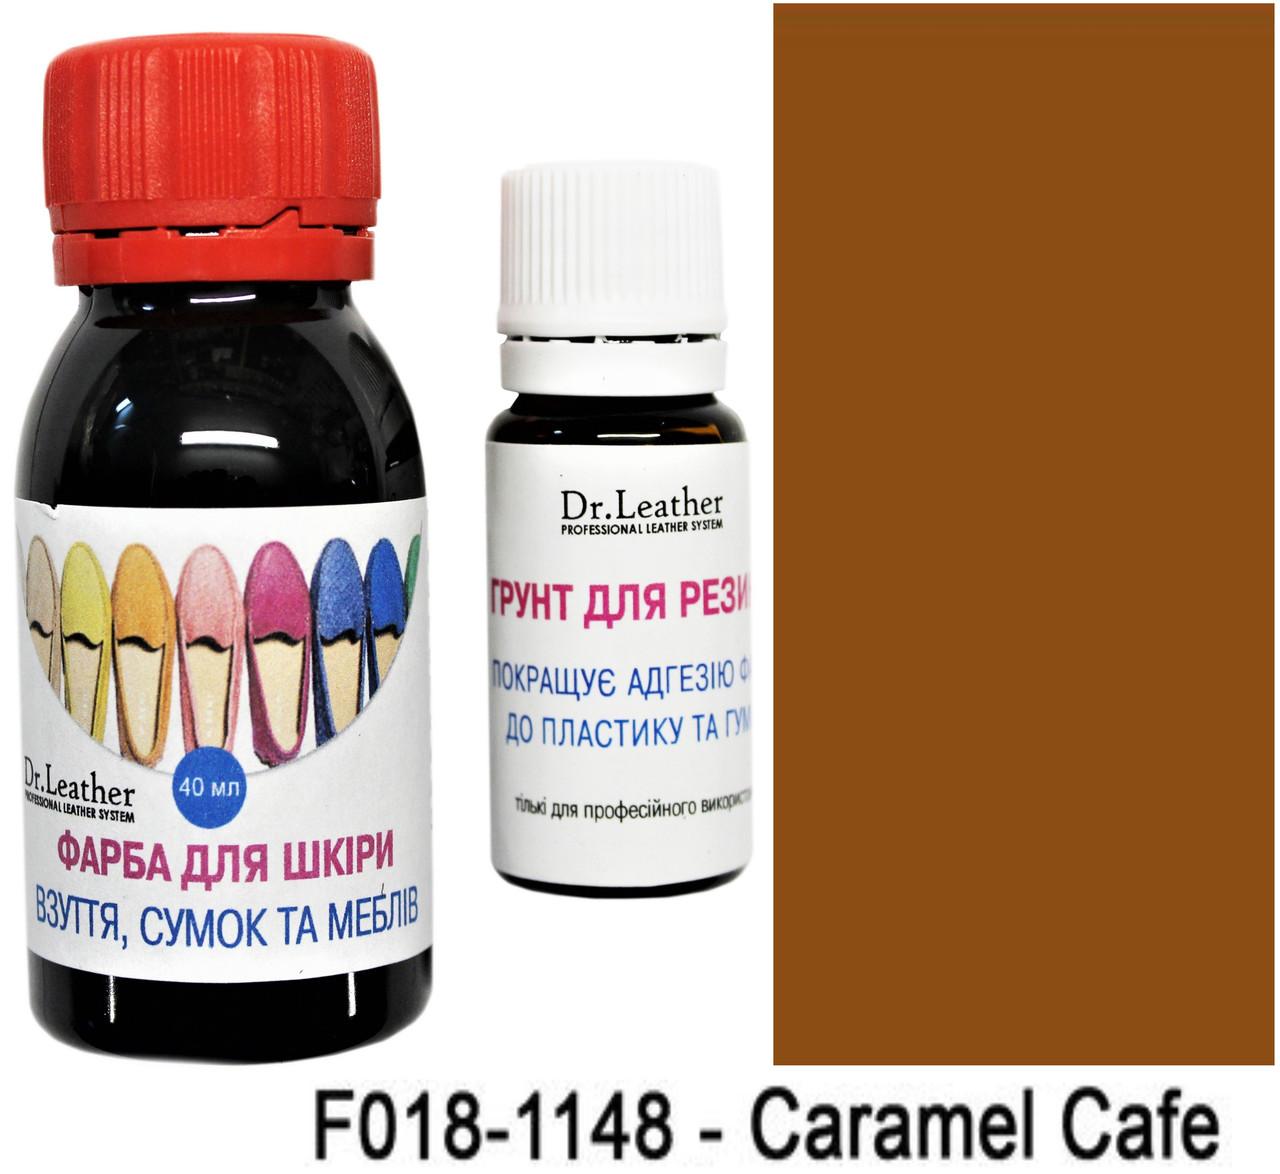 "Фарба для підошви, гуми, поліуретану,пластику 40 мл.""Dr.Leather"" CARAMEL CAFE"